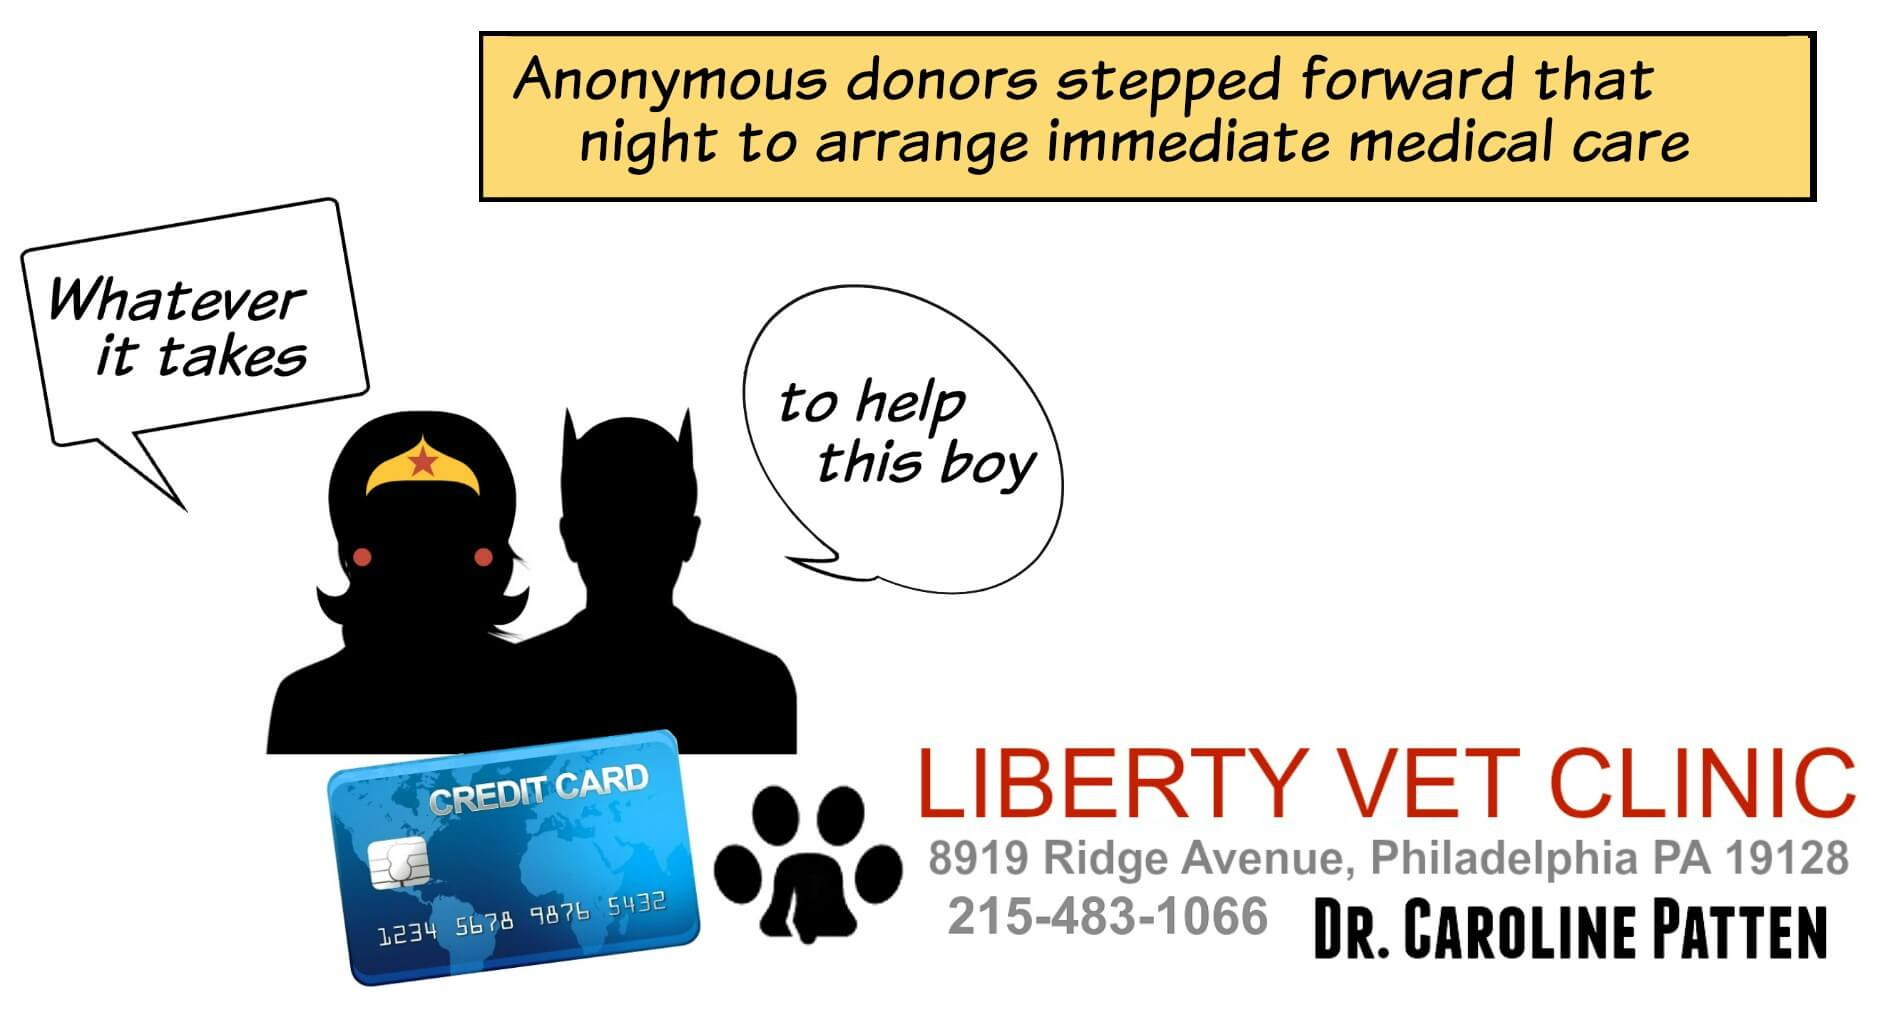 East Falls Local 1-14 liberty vet logo rescuers comic